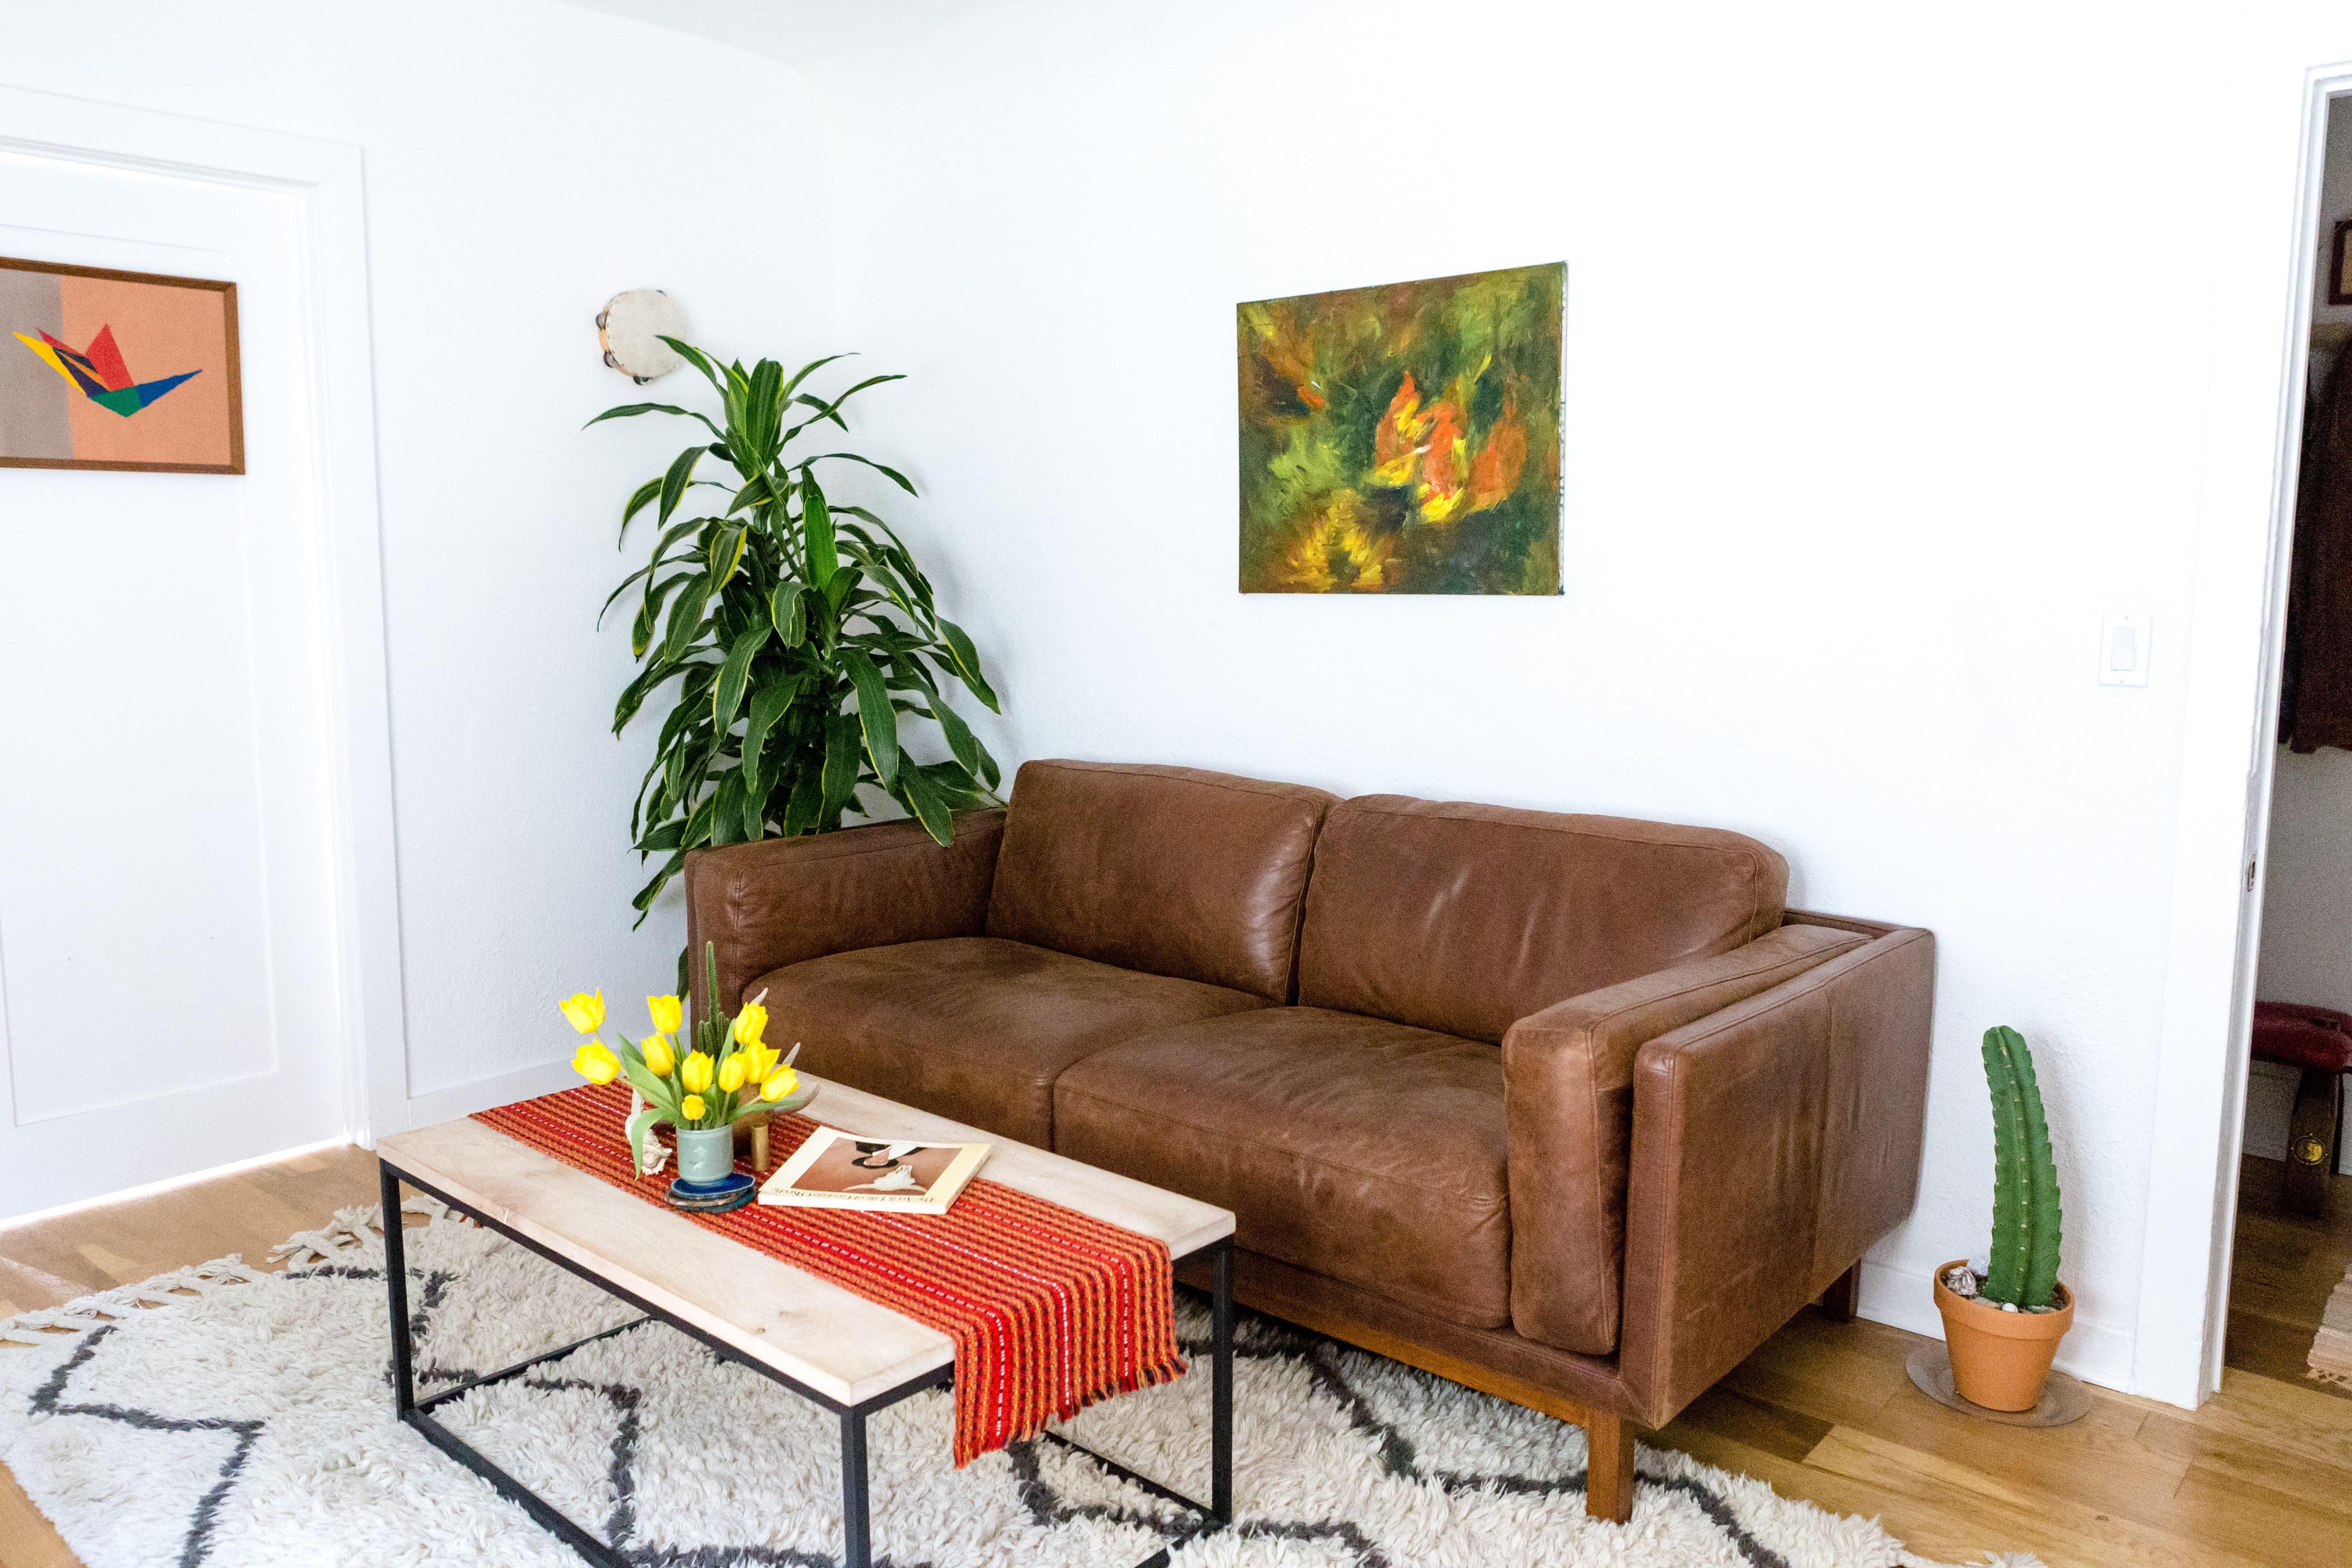 Room Classic Bohemian Meets 70s Minimalist